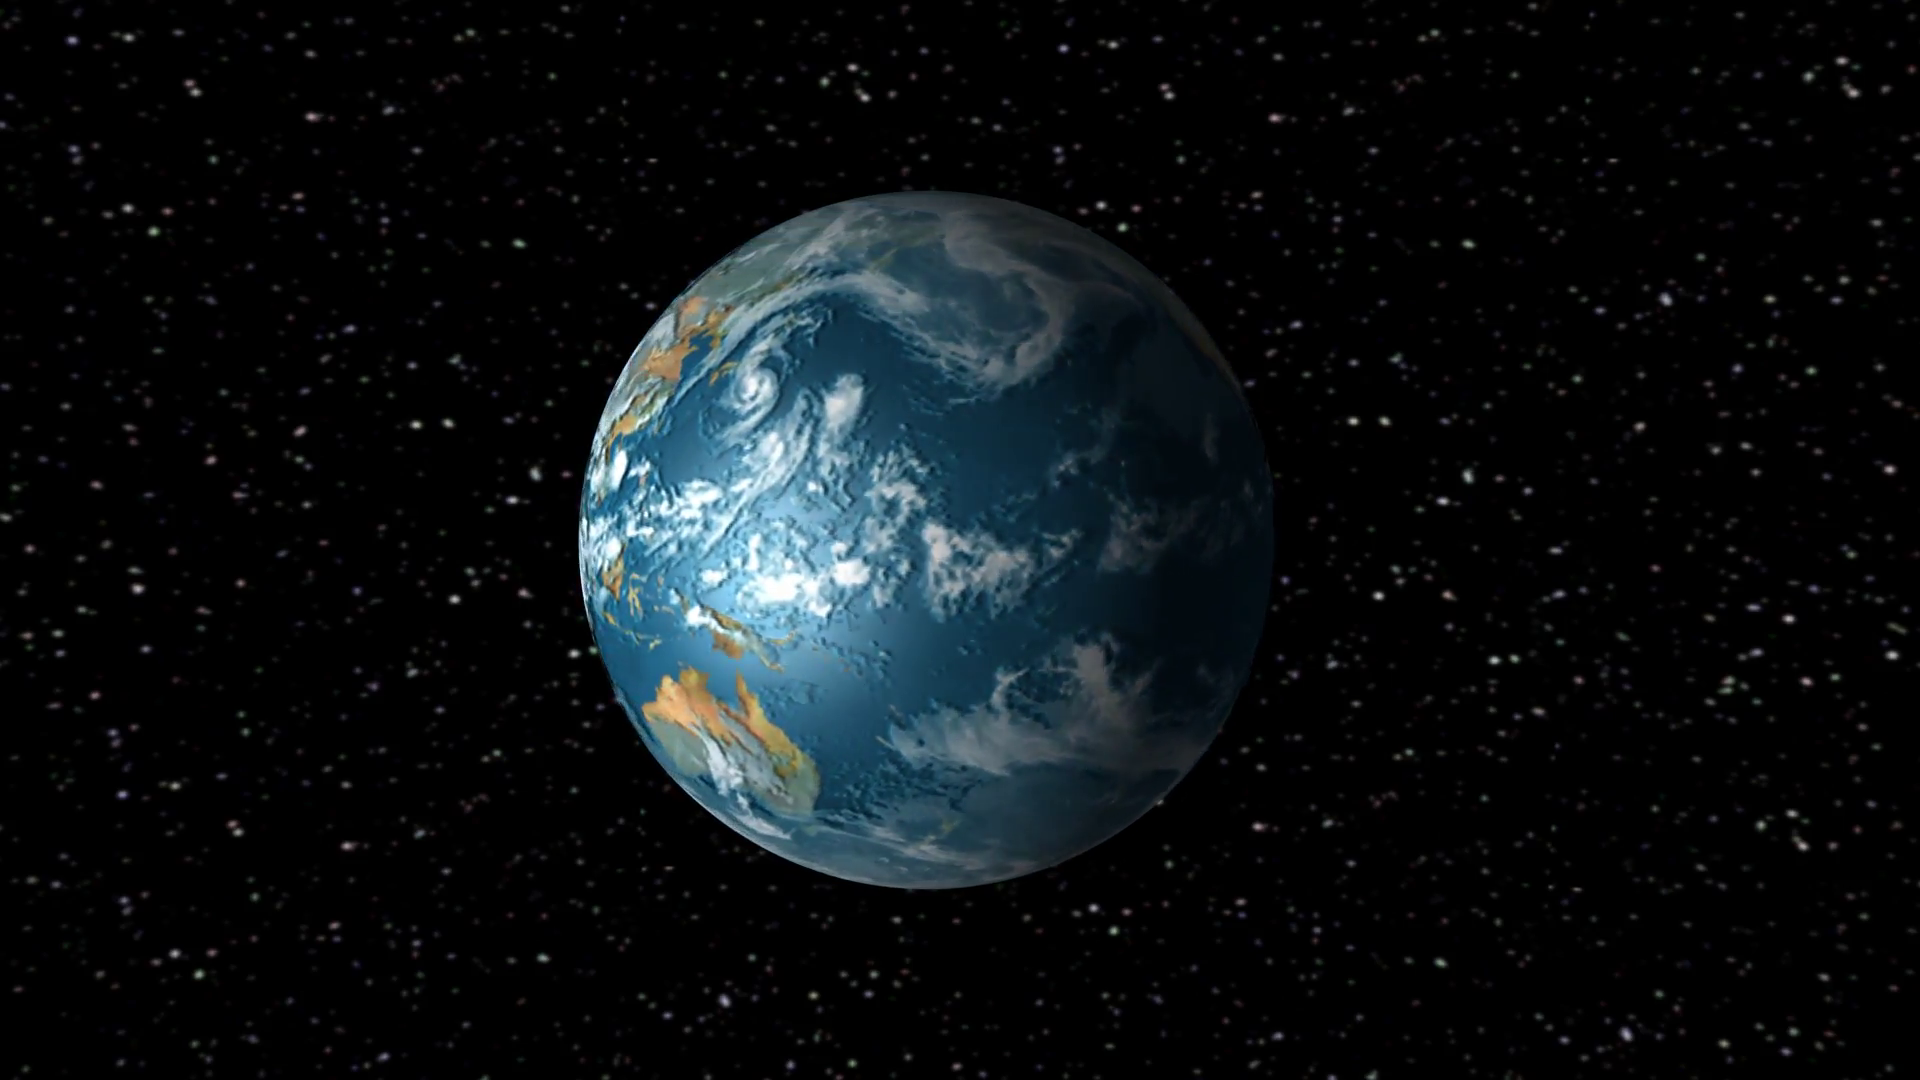 earth-rotation-animation_qj6cxvni__F0000